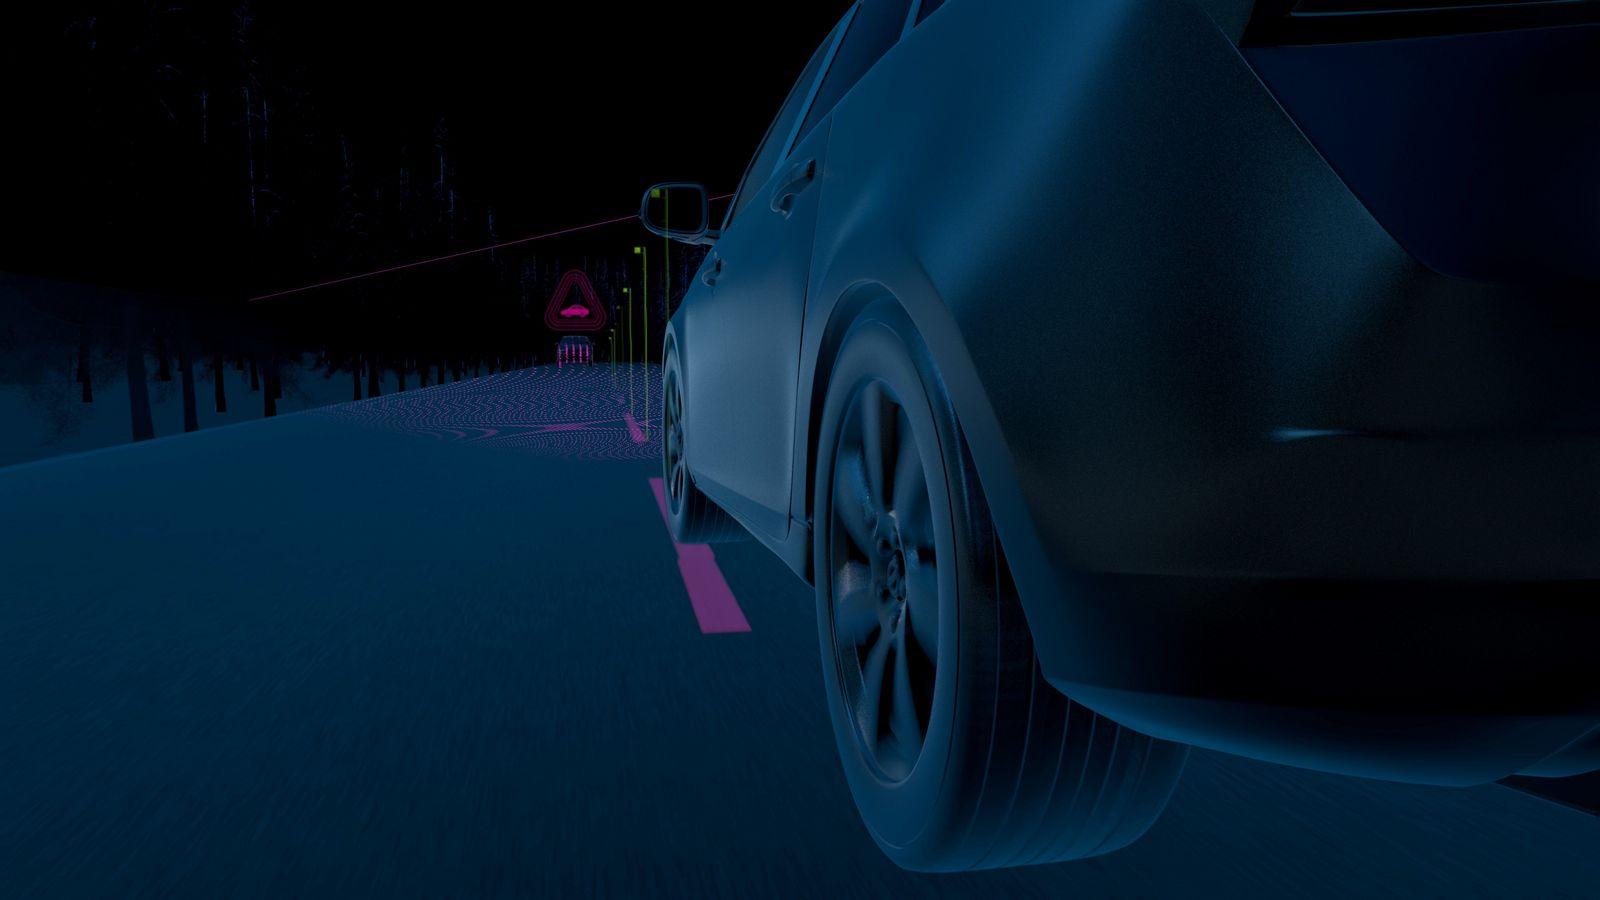 Volvo XC60 automatický vyhýbací manéver